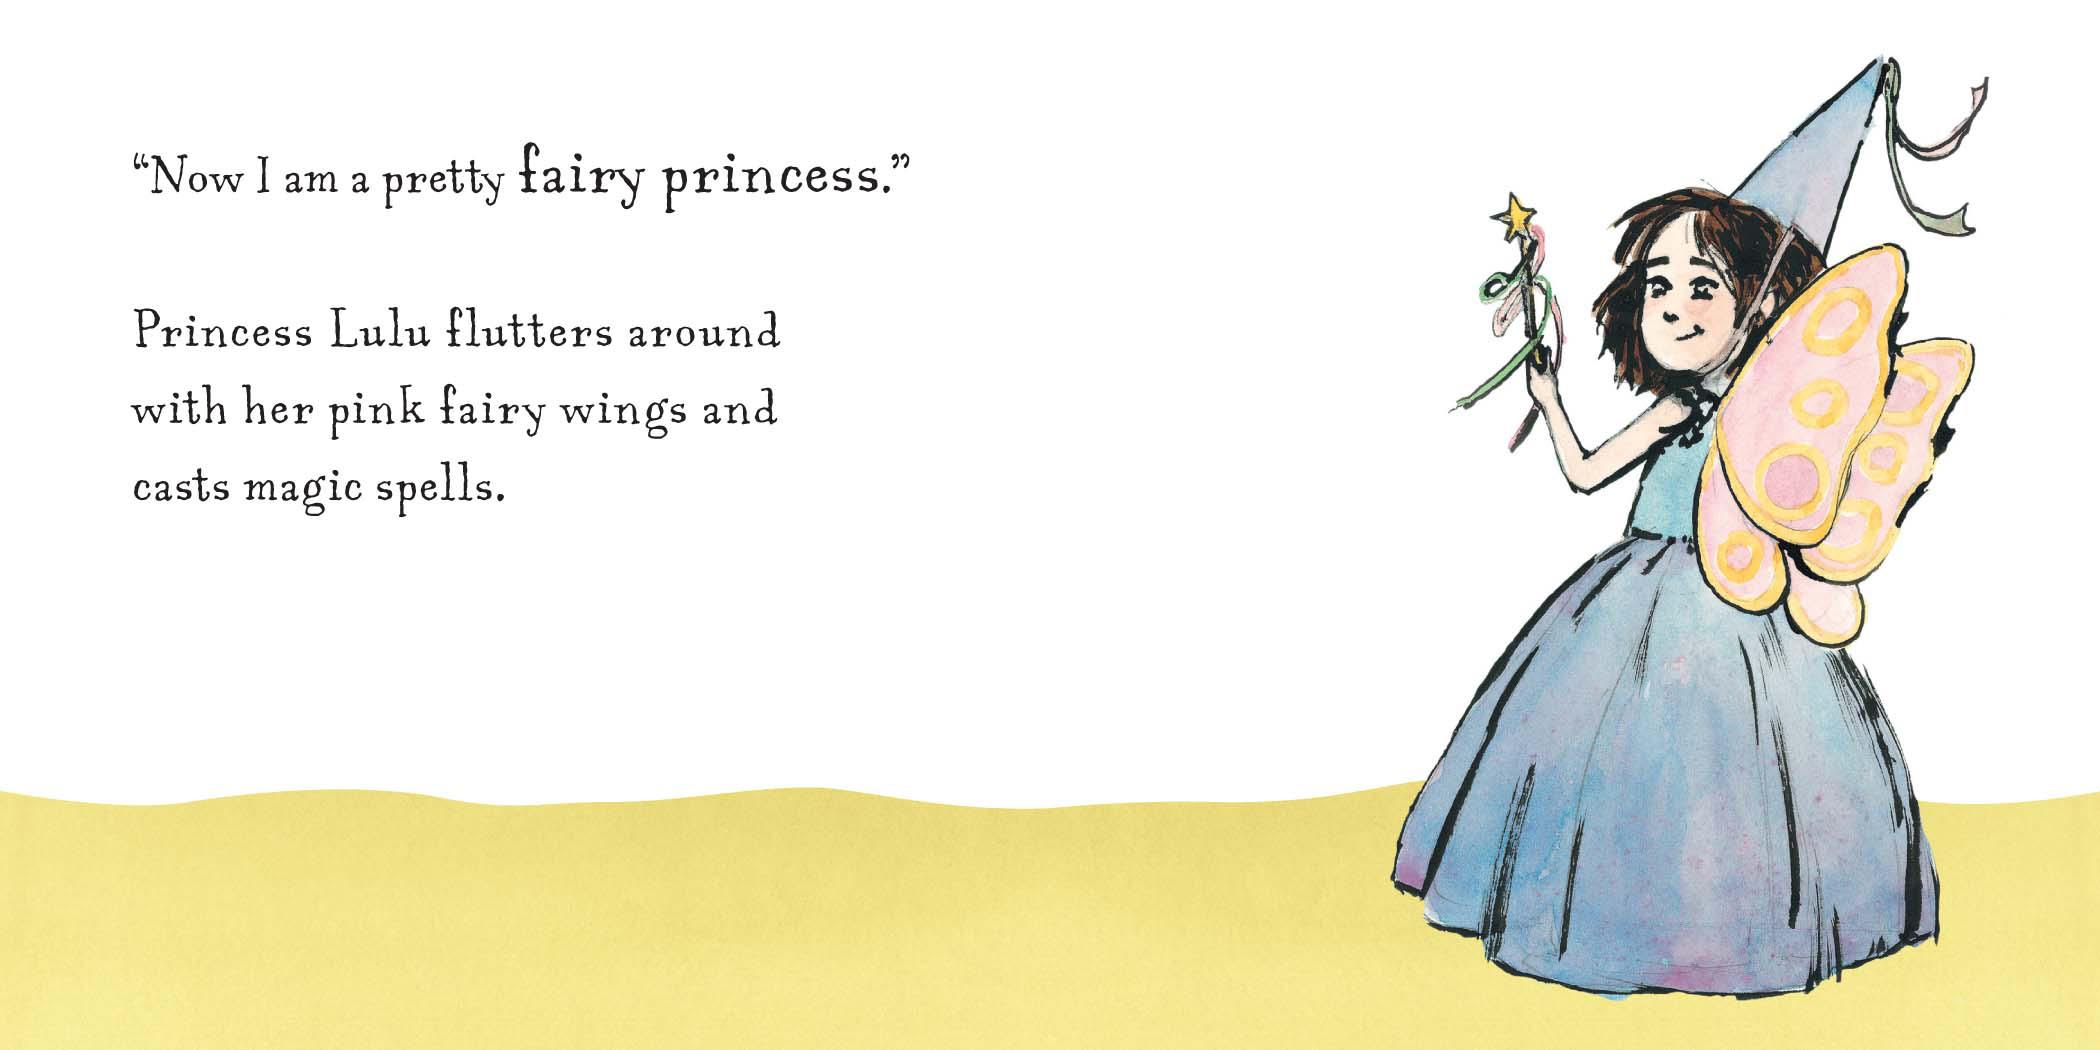 Dress up for girl - A Look Inside Ladybug Girl Dresses Up Board Book Click On Images To Enlarge